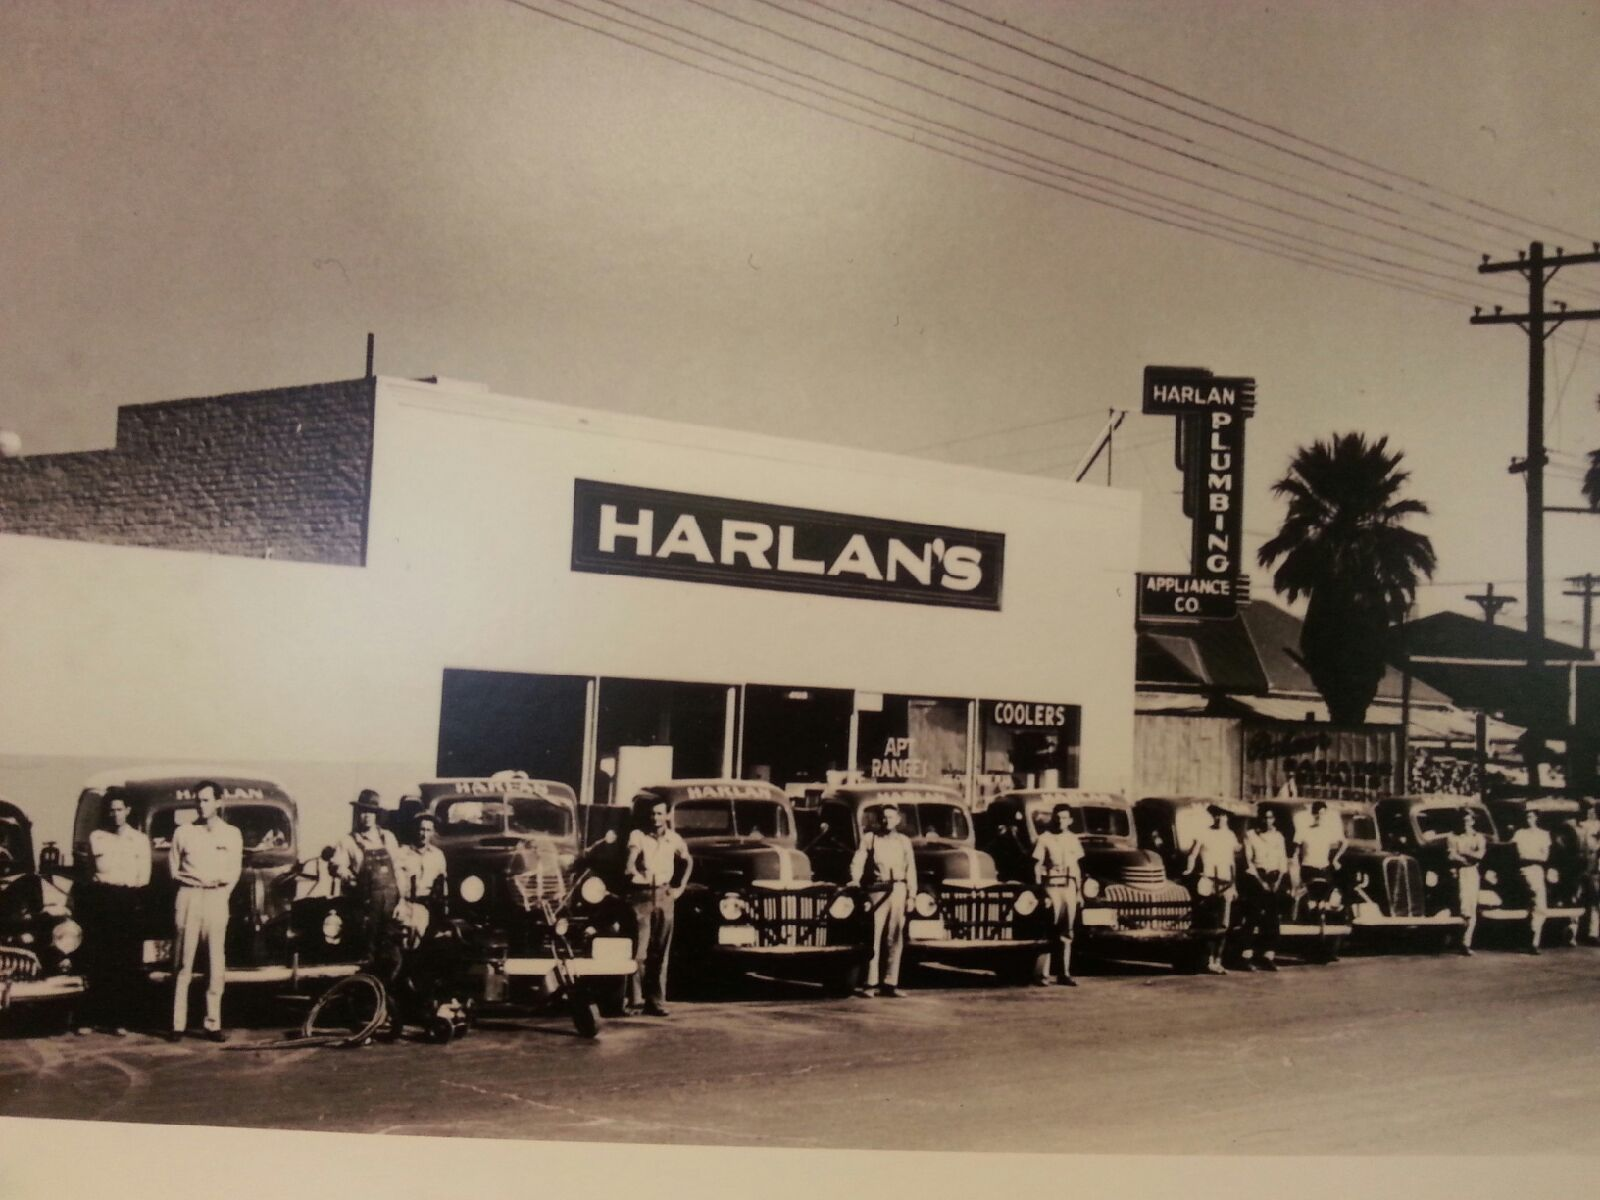 The Harlan Company, LLC